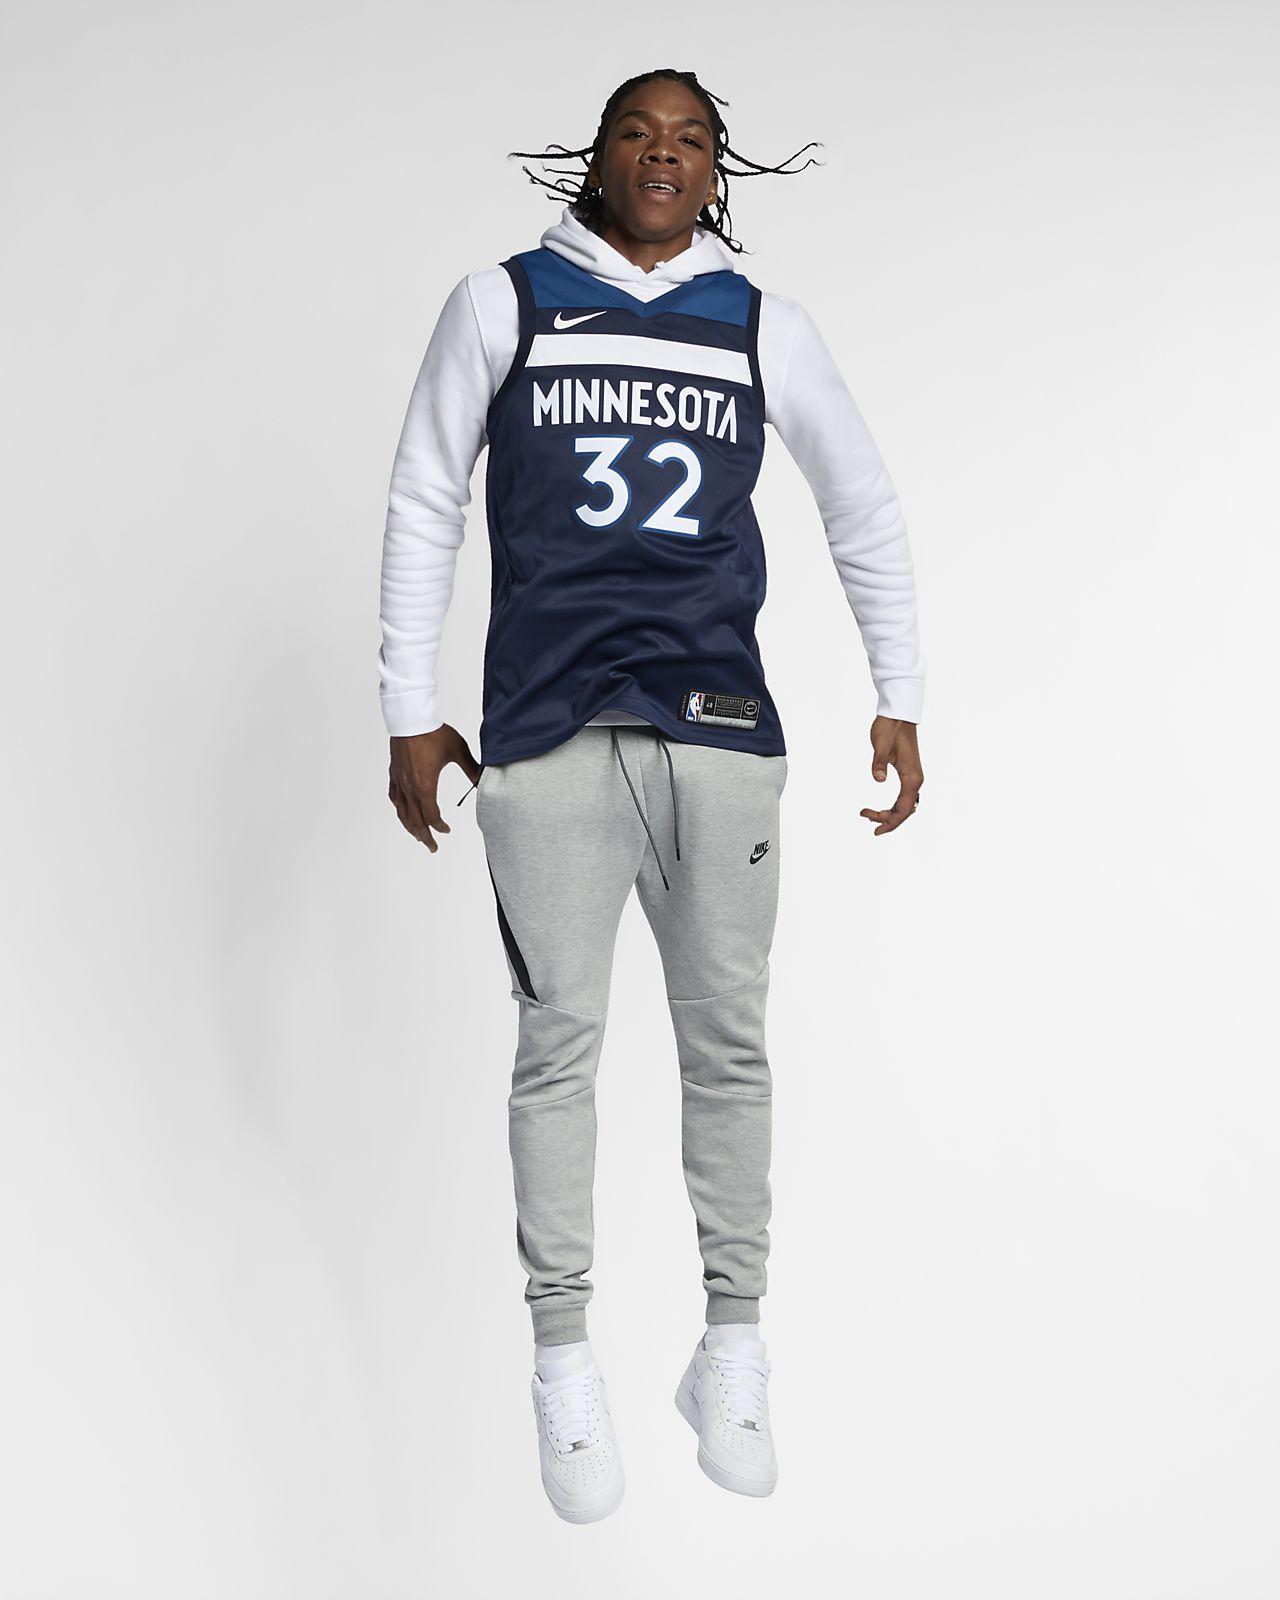 2fb9ccf7b ... Karl-Anthony Towns Icon Edition Swingman (Minnesota Timberwolves) Men s  Nike NBA Connected Jersey